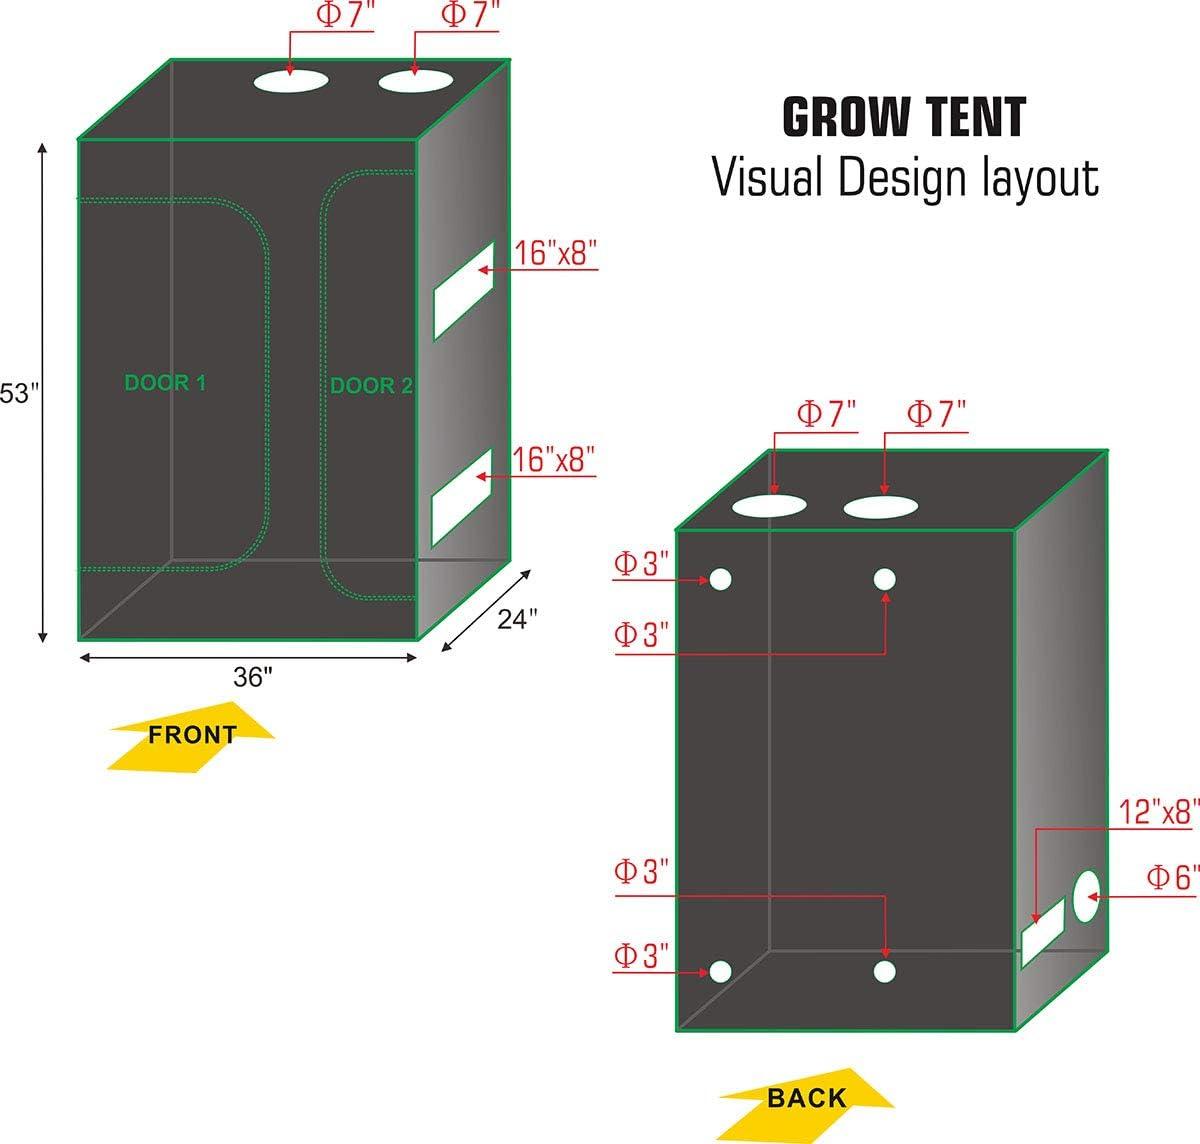 Grow Light Hangers Trellis Netting Indoor Plant Grow Tent Kit Hongruilite 36x24x53 2-in-1 Grow Tent Room w//Waterproof Floor Tray Digital Hygrometer 24 Hour Timer 60mm Bonsai Shears